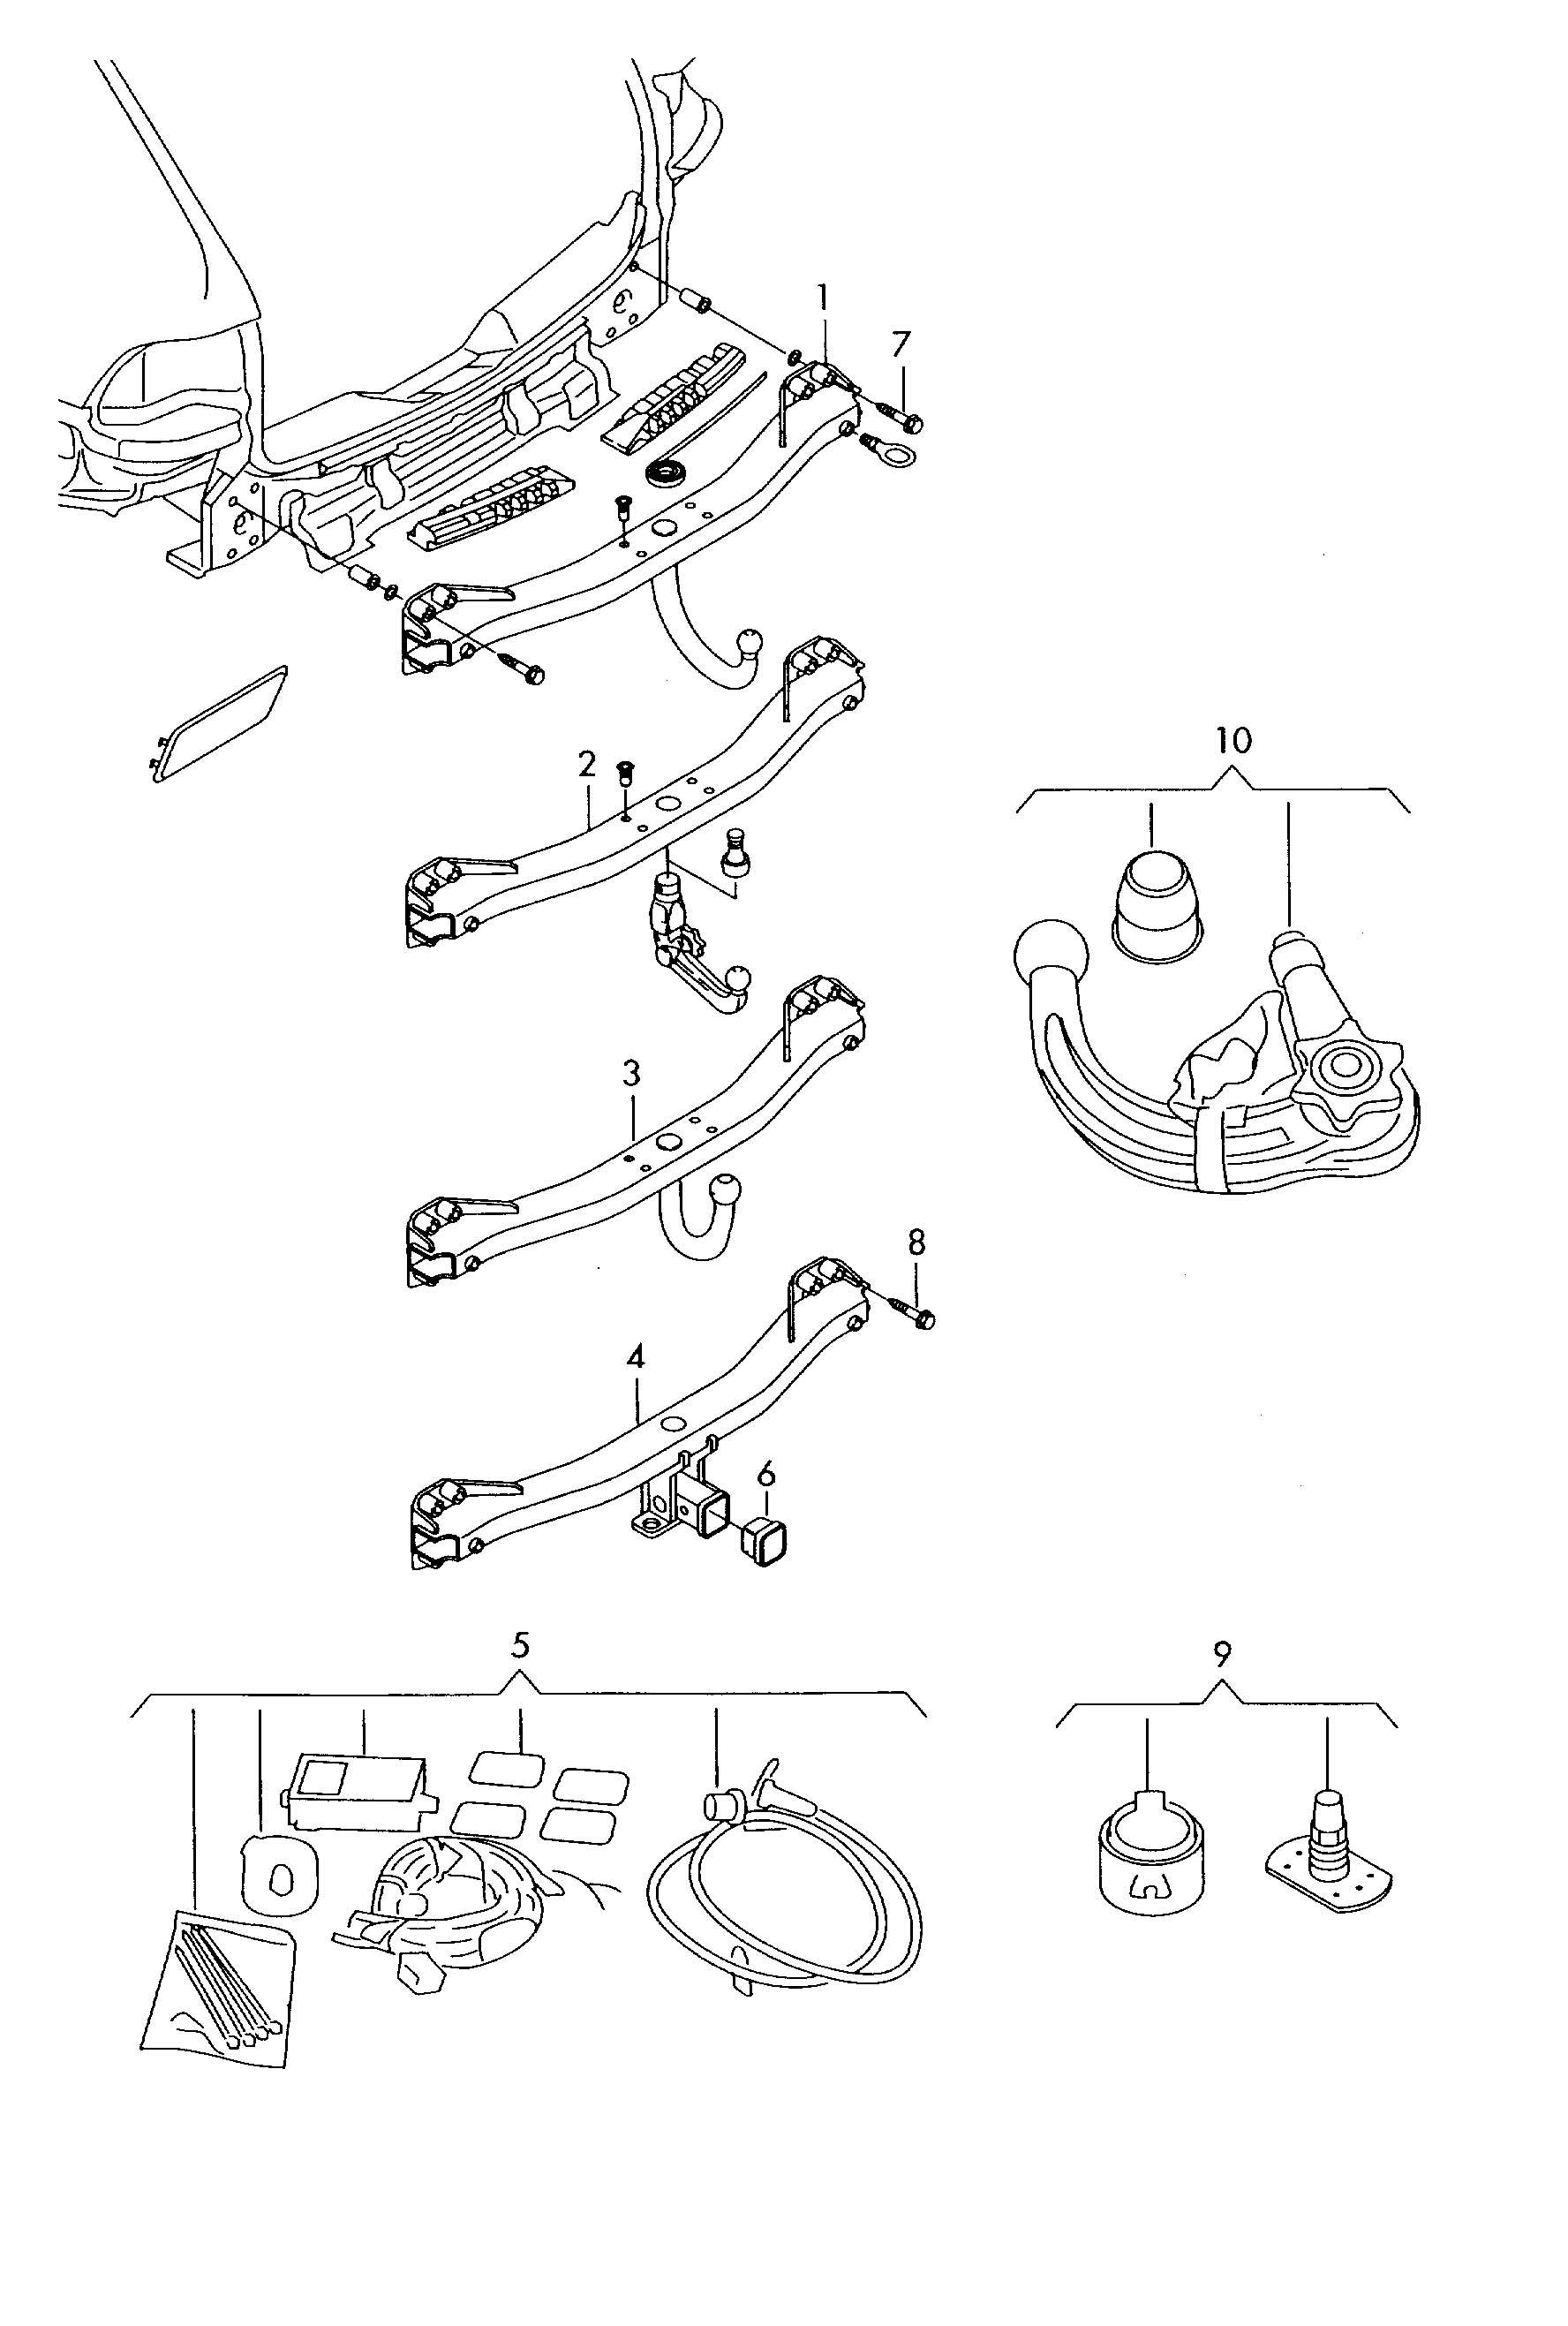 Volkswagen Tiguan Trailer Hitch Electrical Installation